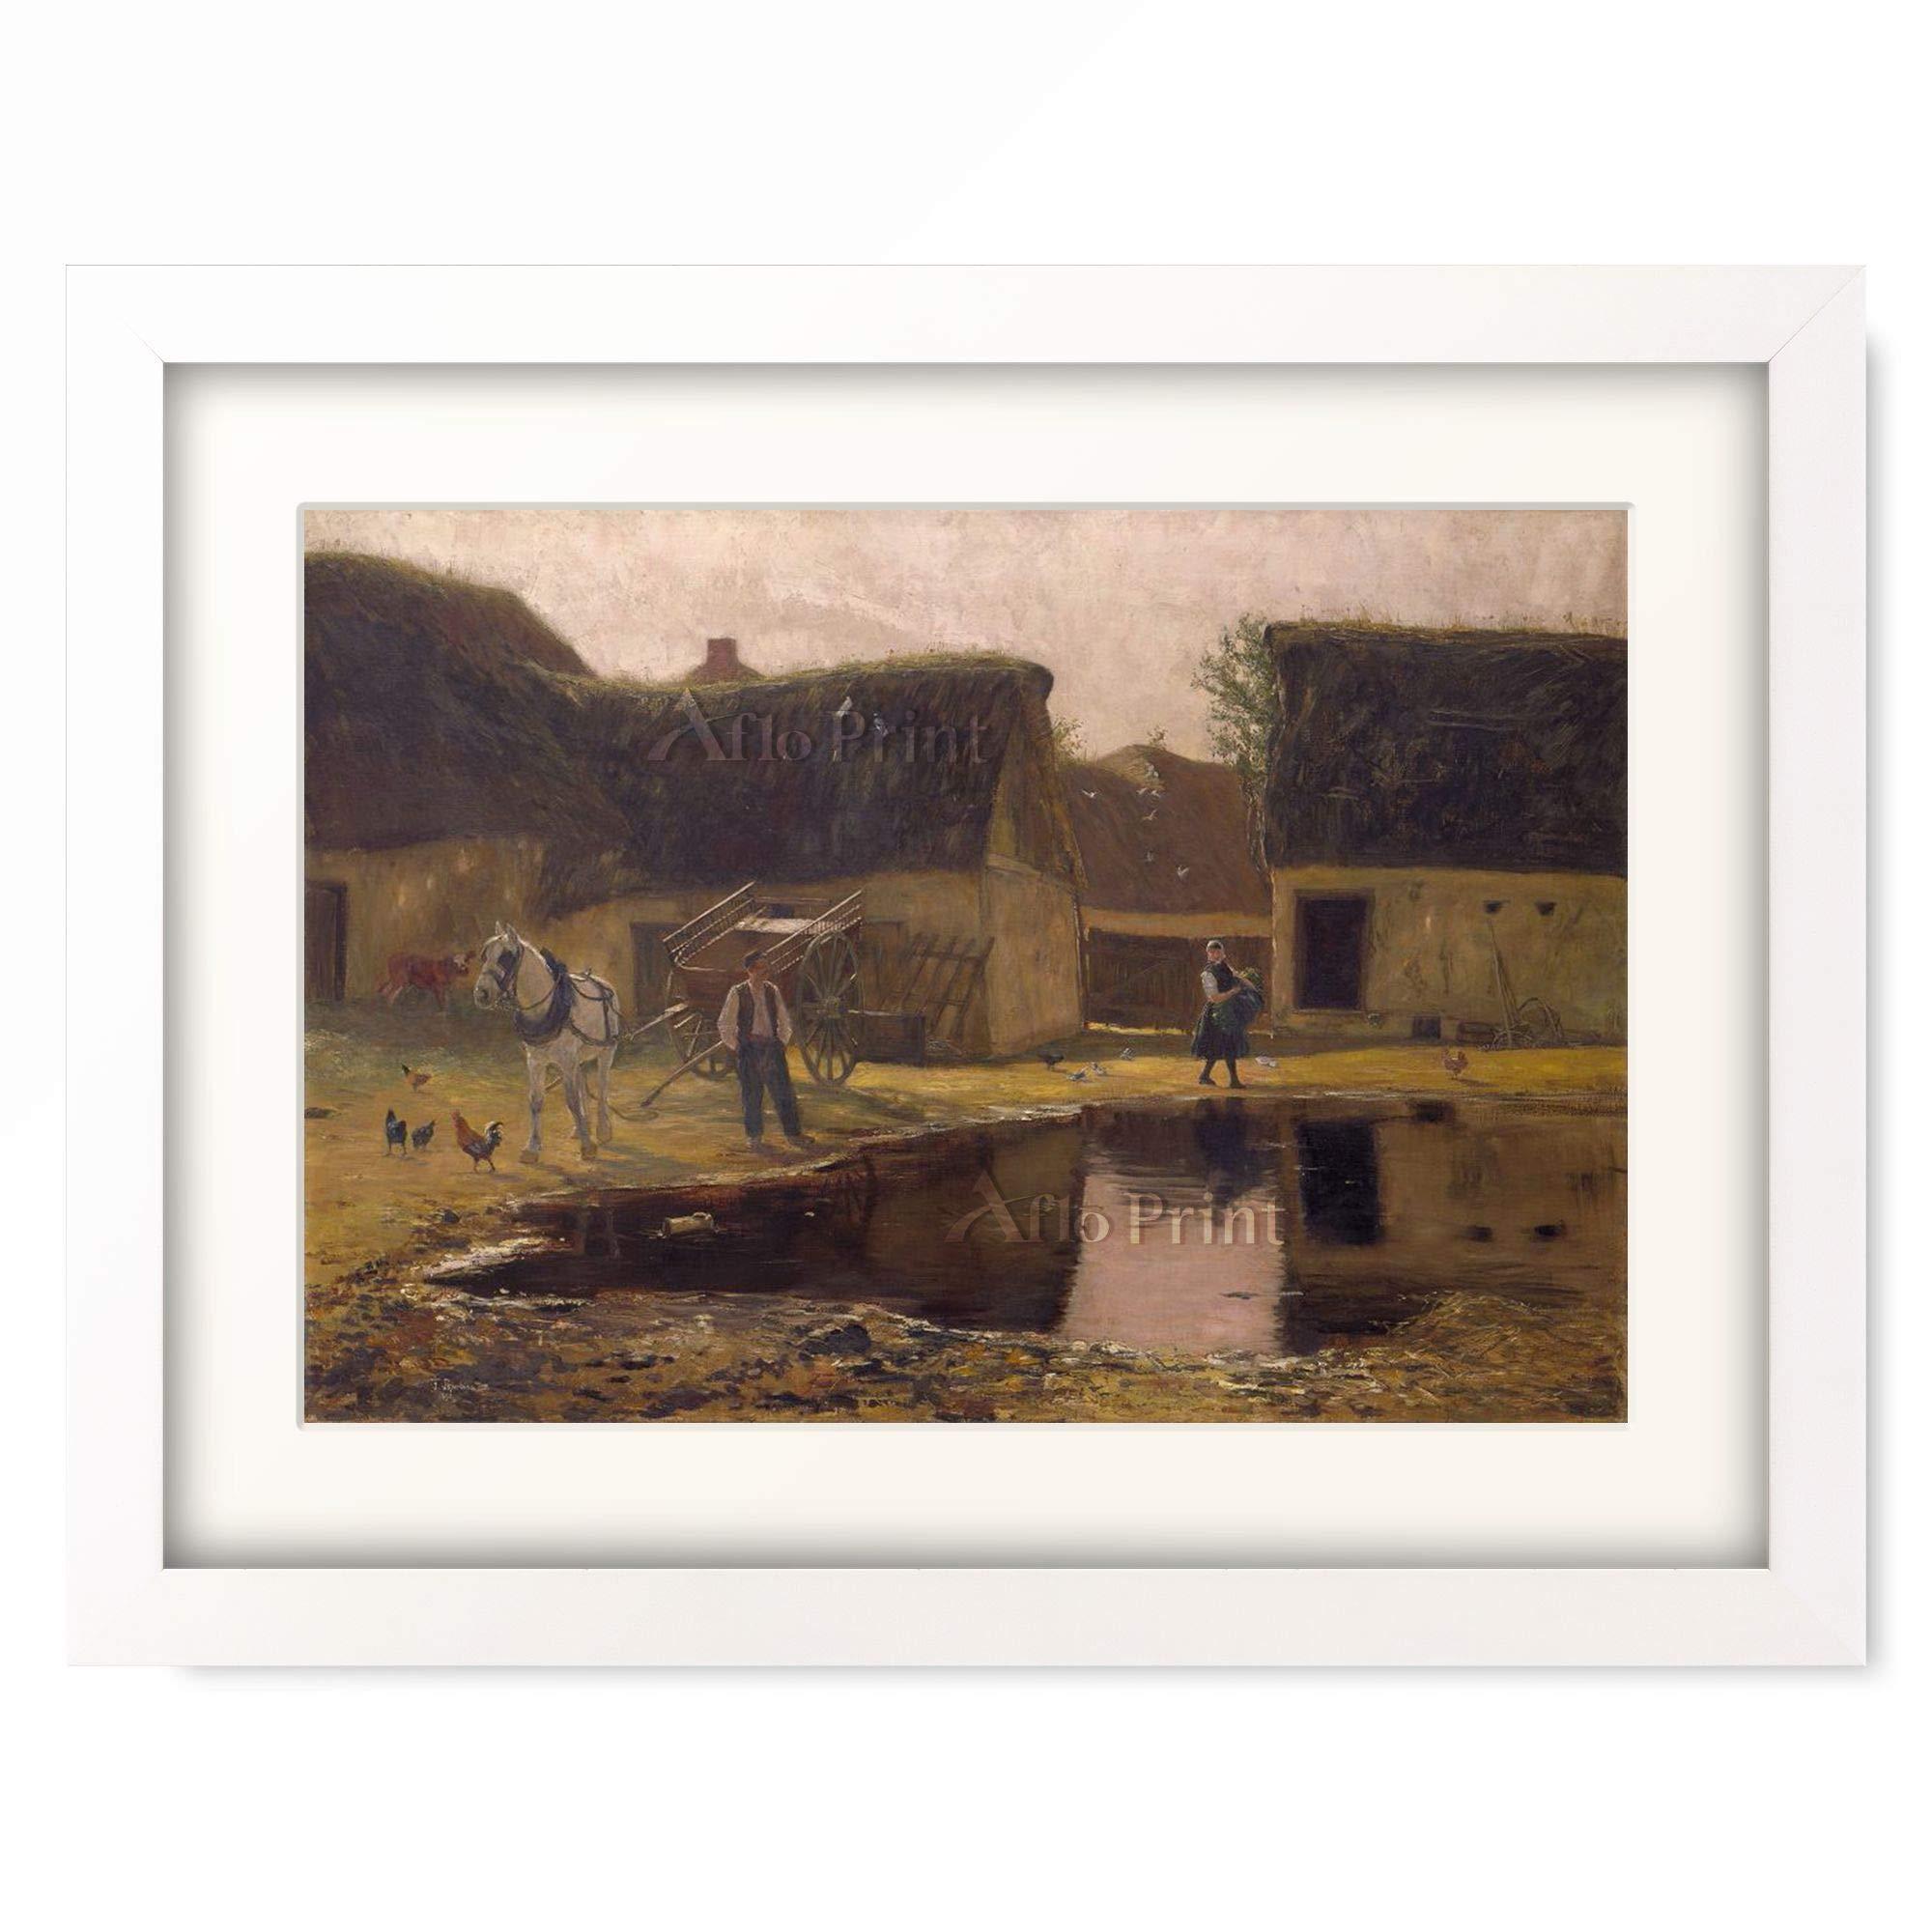 Amazon Franz Skarbina Farmstead In The Picardy Region 1890 É¡è£…アート作品 ¢ートフレーム Ýスター ªンライン通販